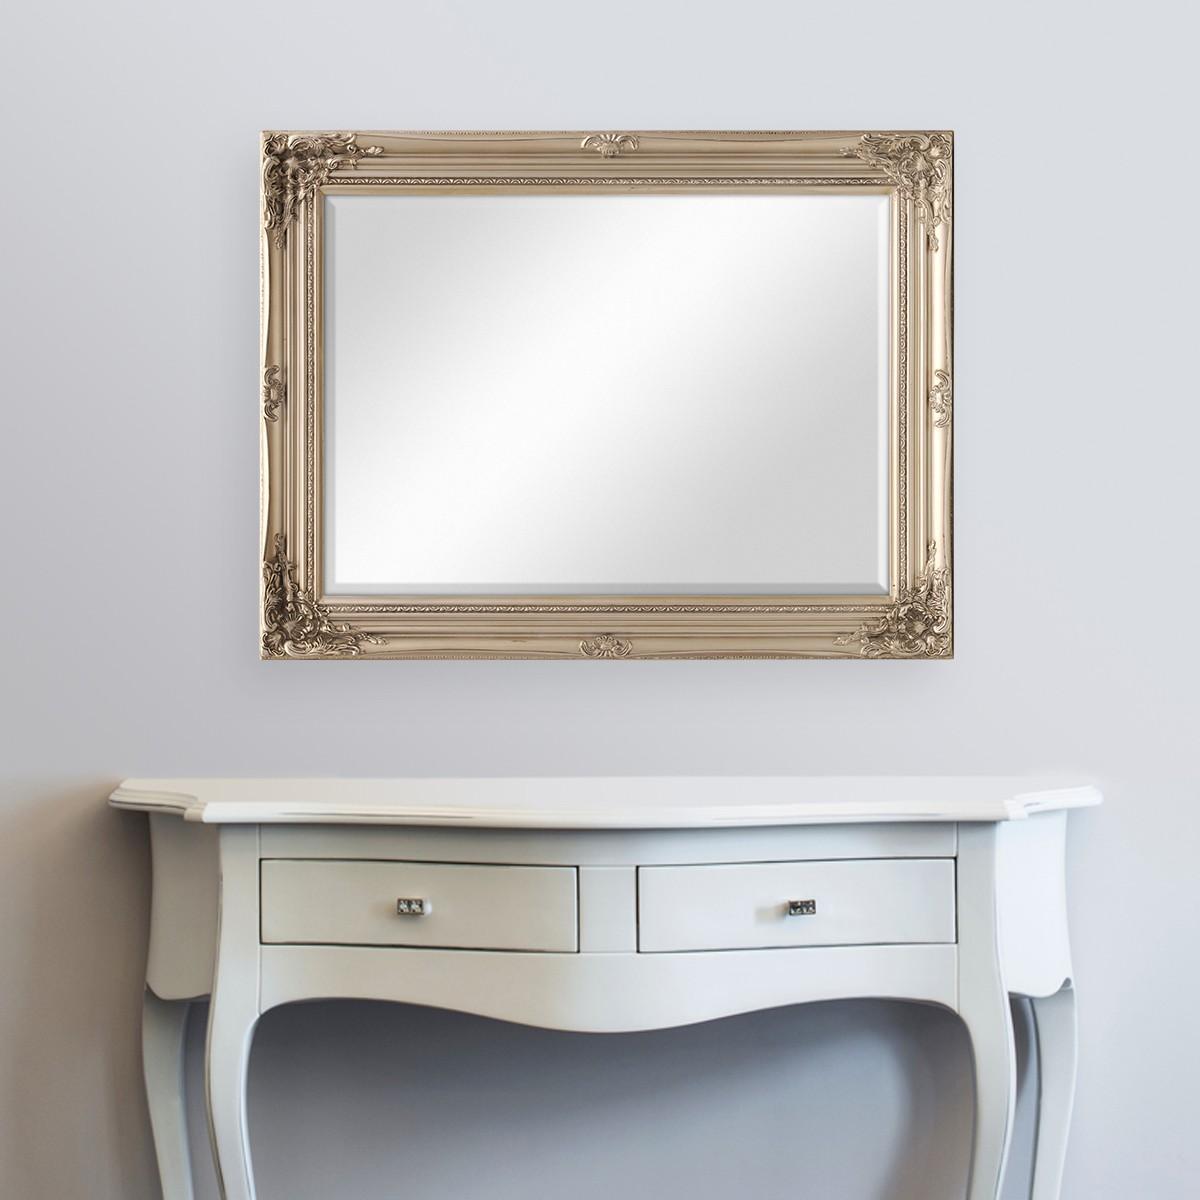 wand spiegel im barock rahmen antik silber mit. Black Bedroom Furniture Sets. Home Design Ideas